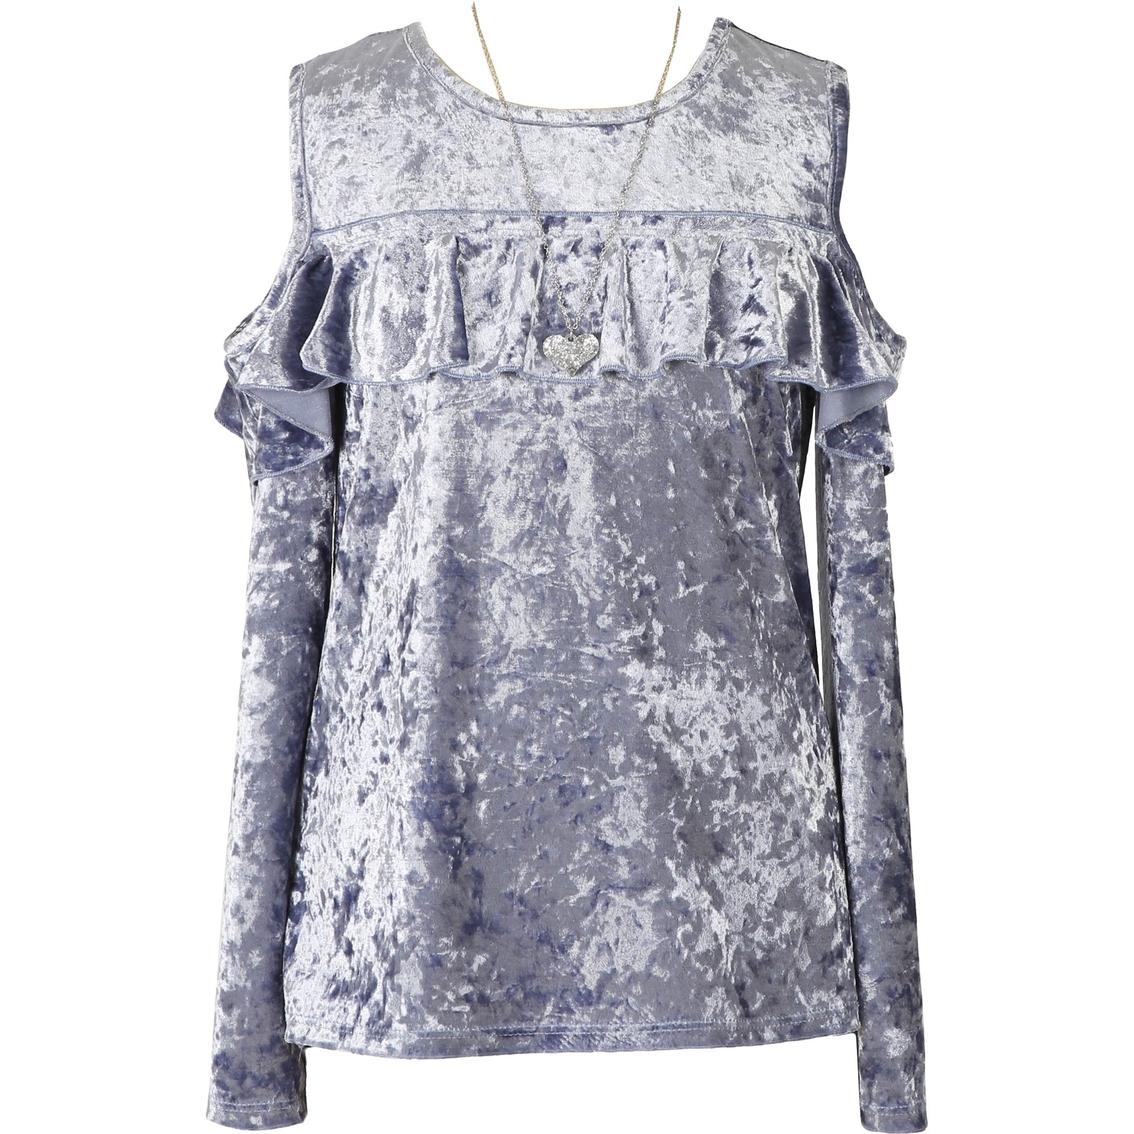 9ba7f1451 Speechless Girls Crushed Velvet Cold Shoulder Top With Necklace Trim ...